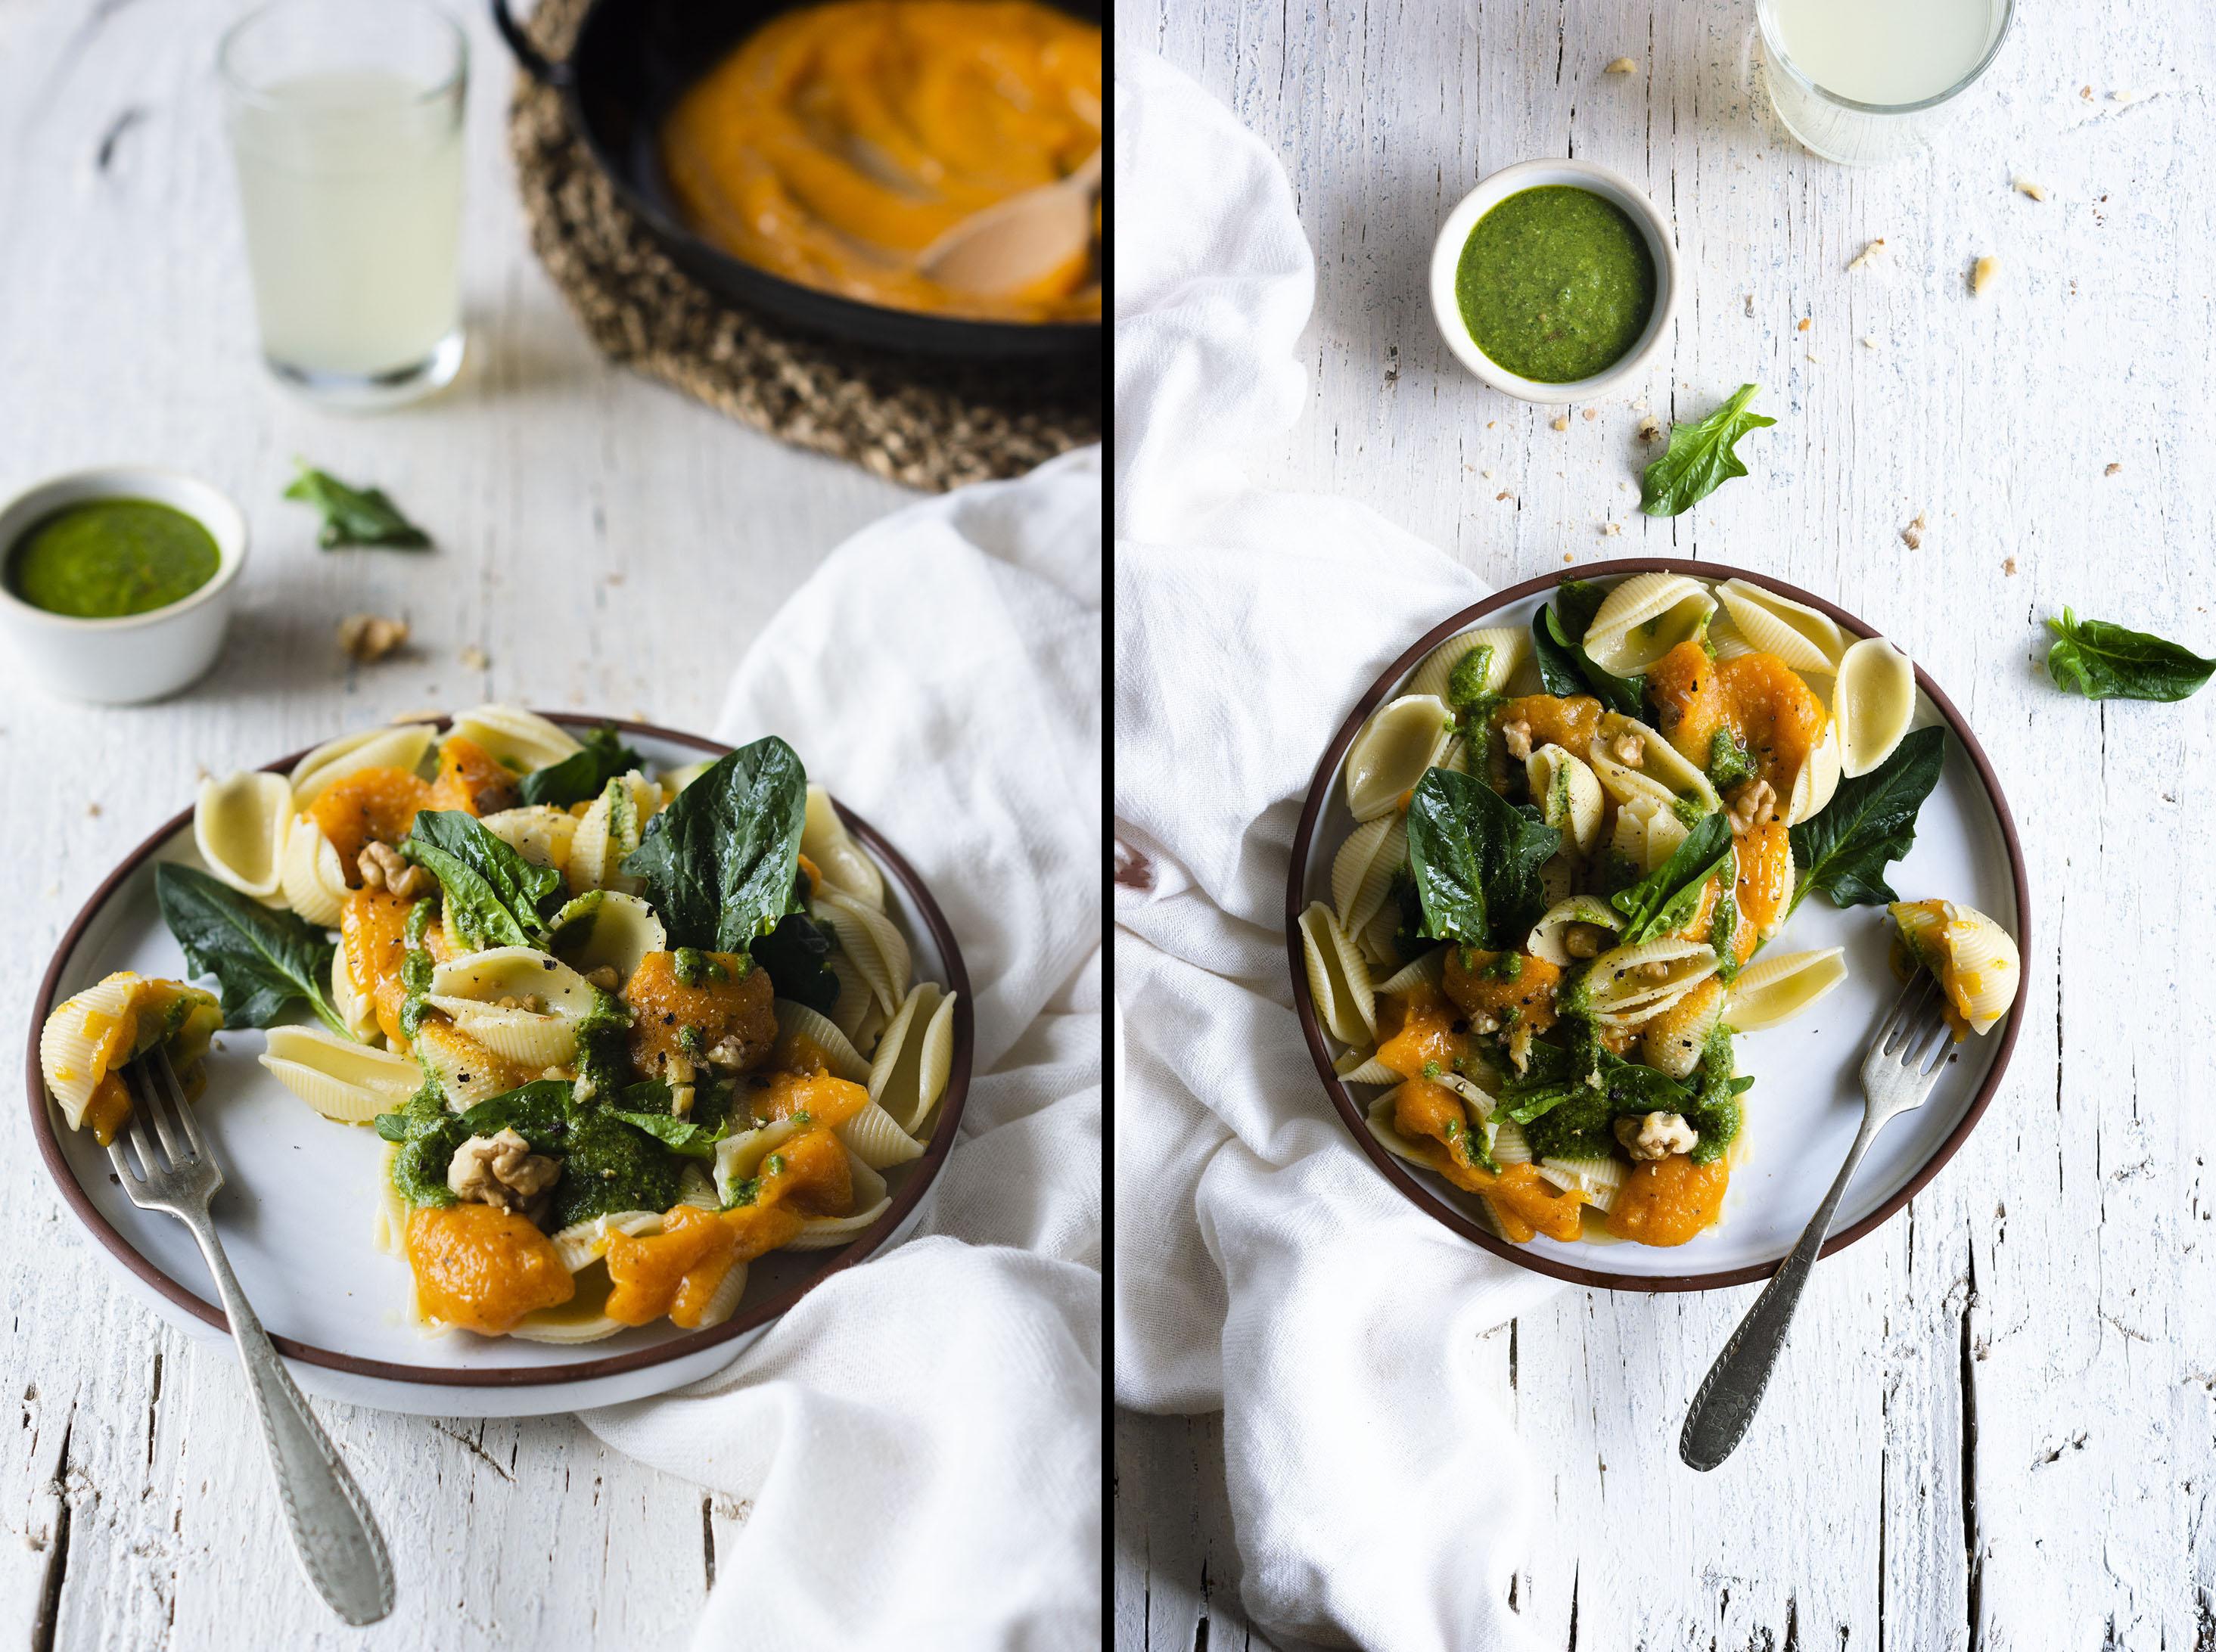 Extra-creamy vegan Pumpkin Spinach Pasta